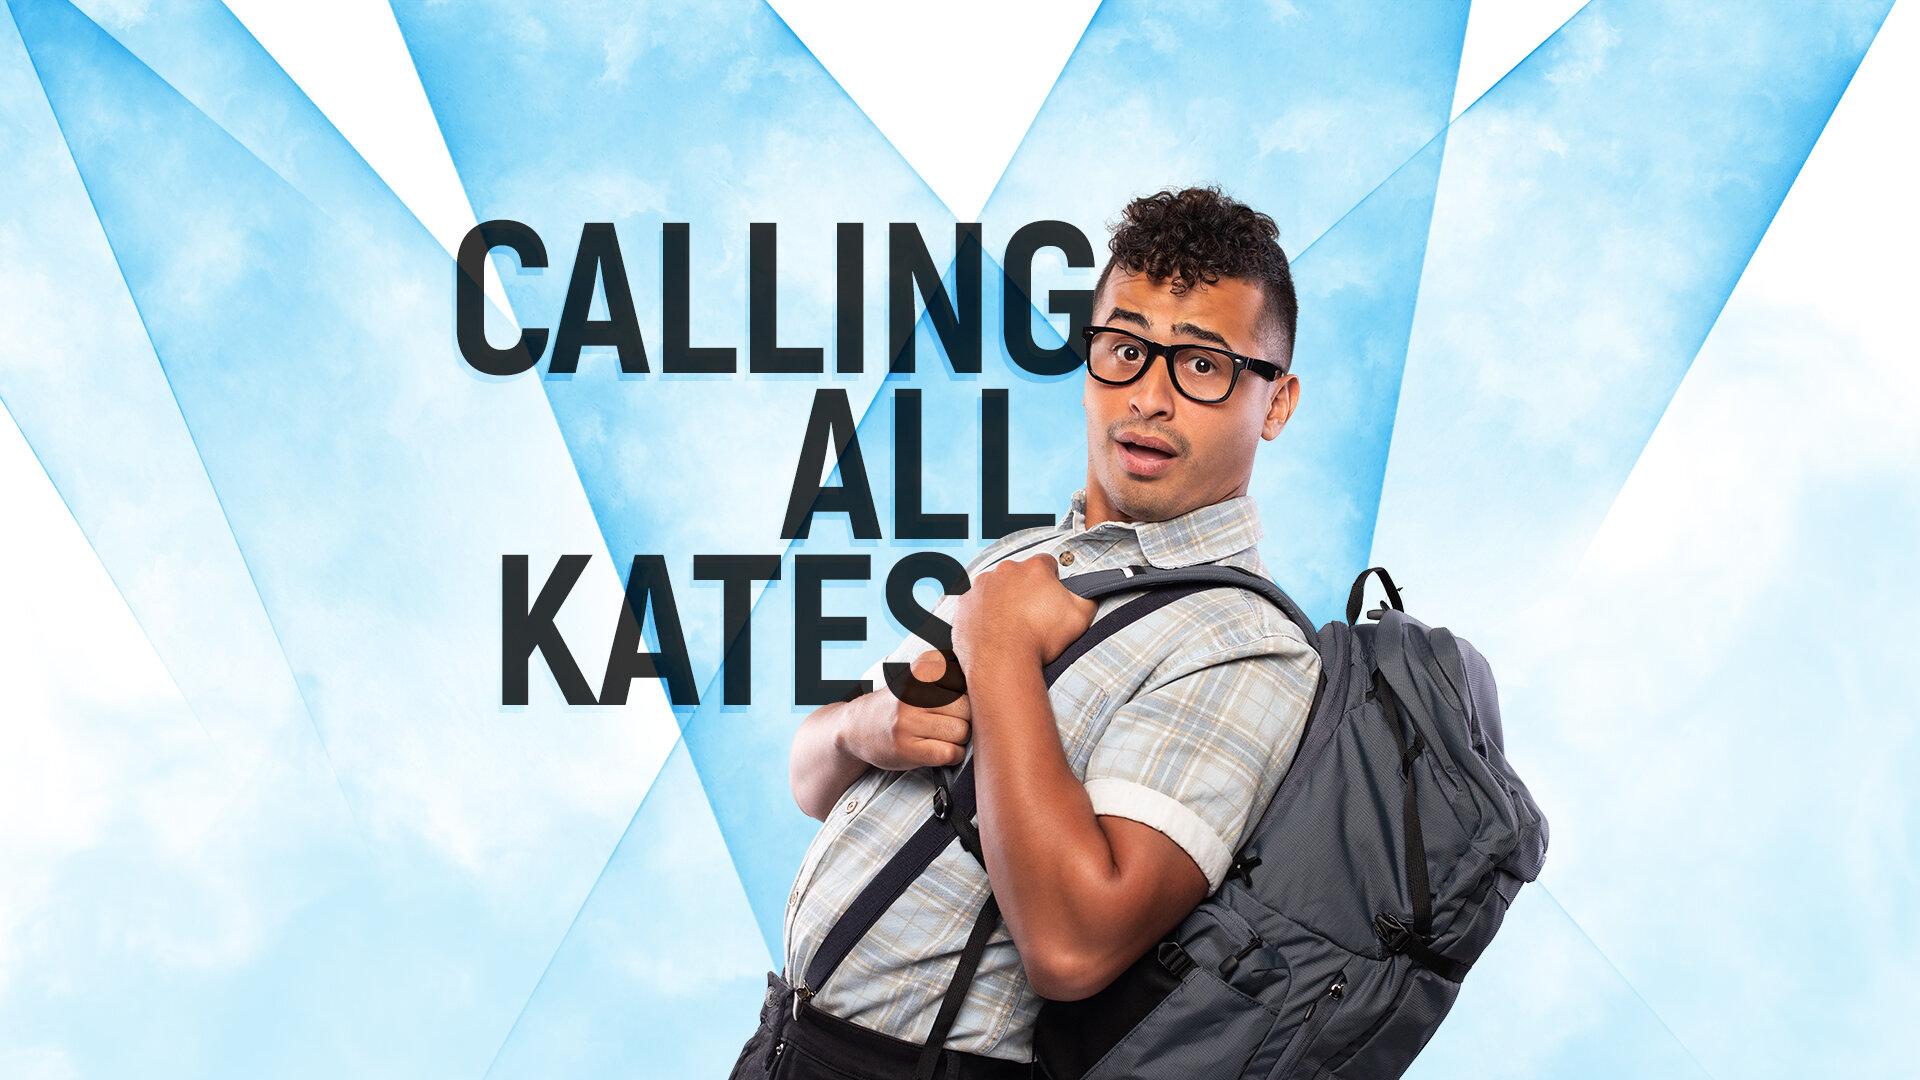 CallingAllKates_wide.jpg